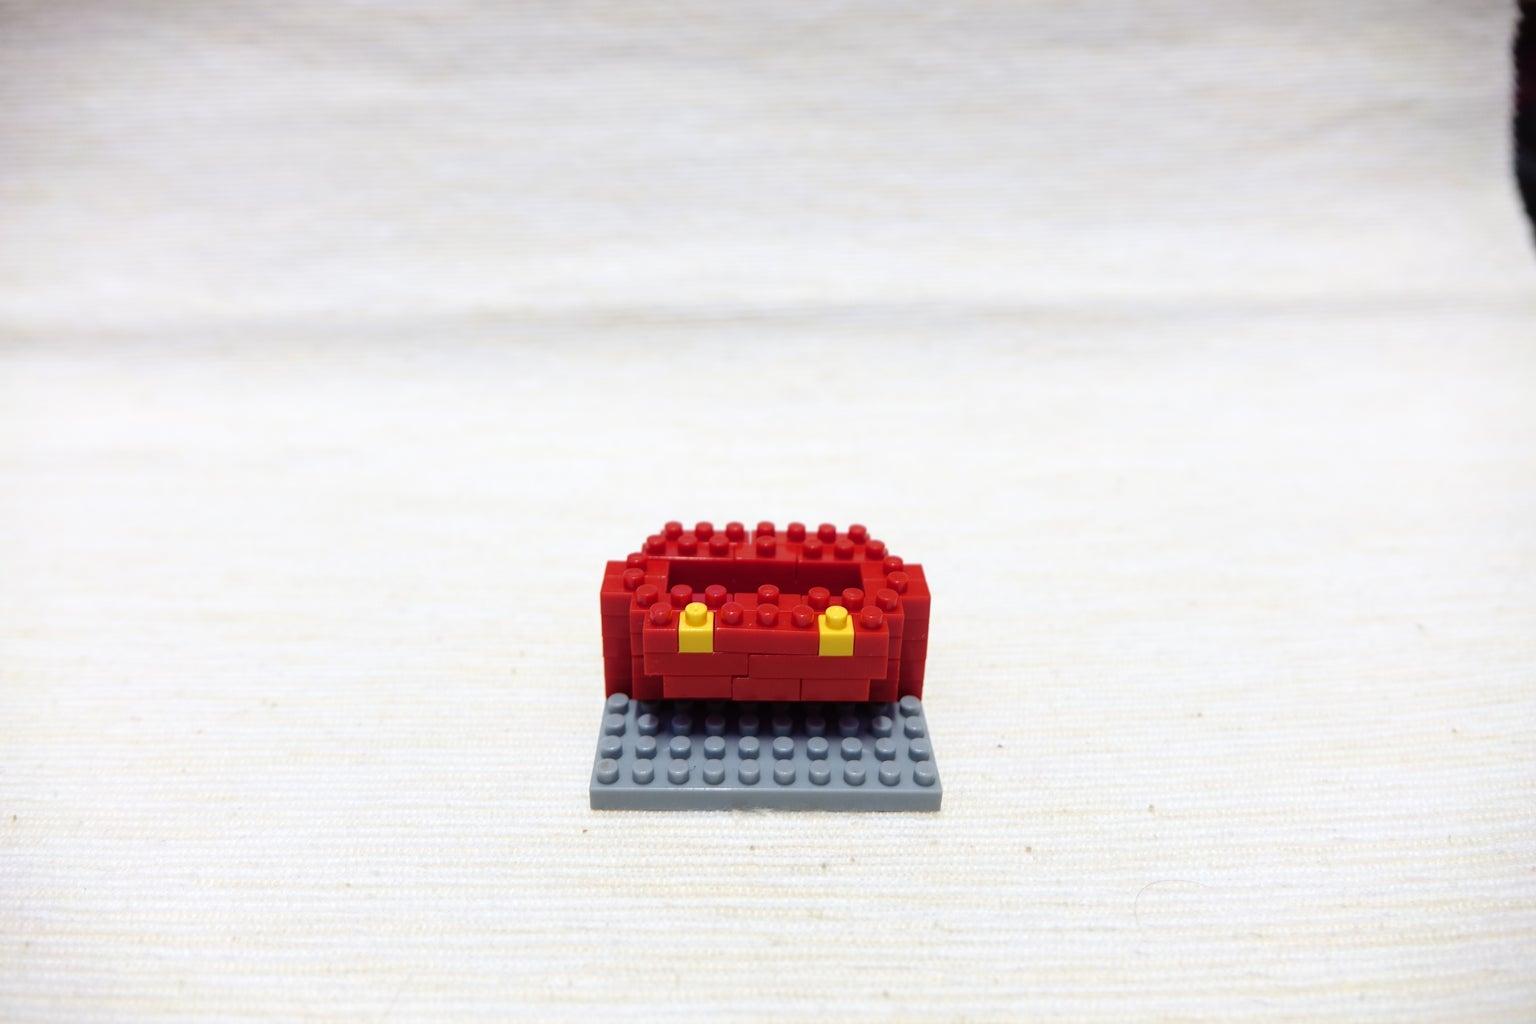 Red Block 1*1, 1*1